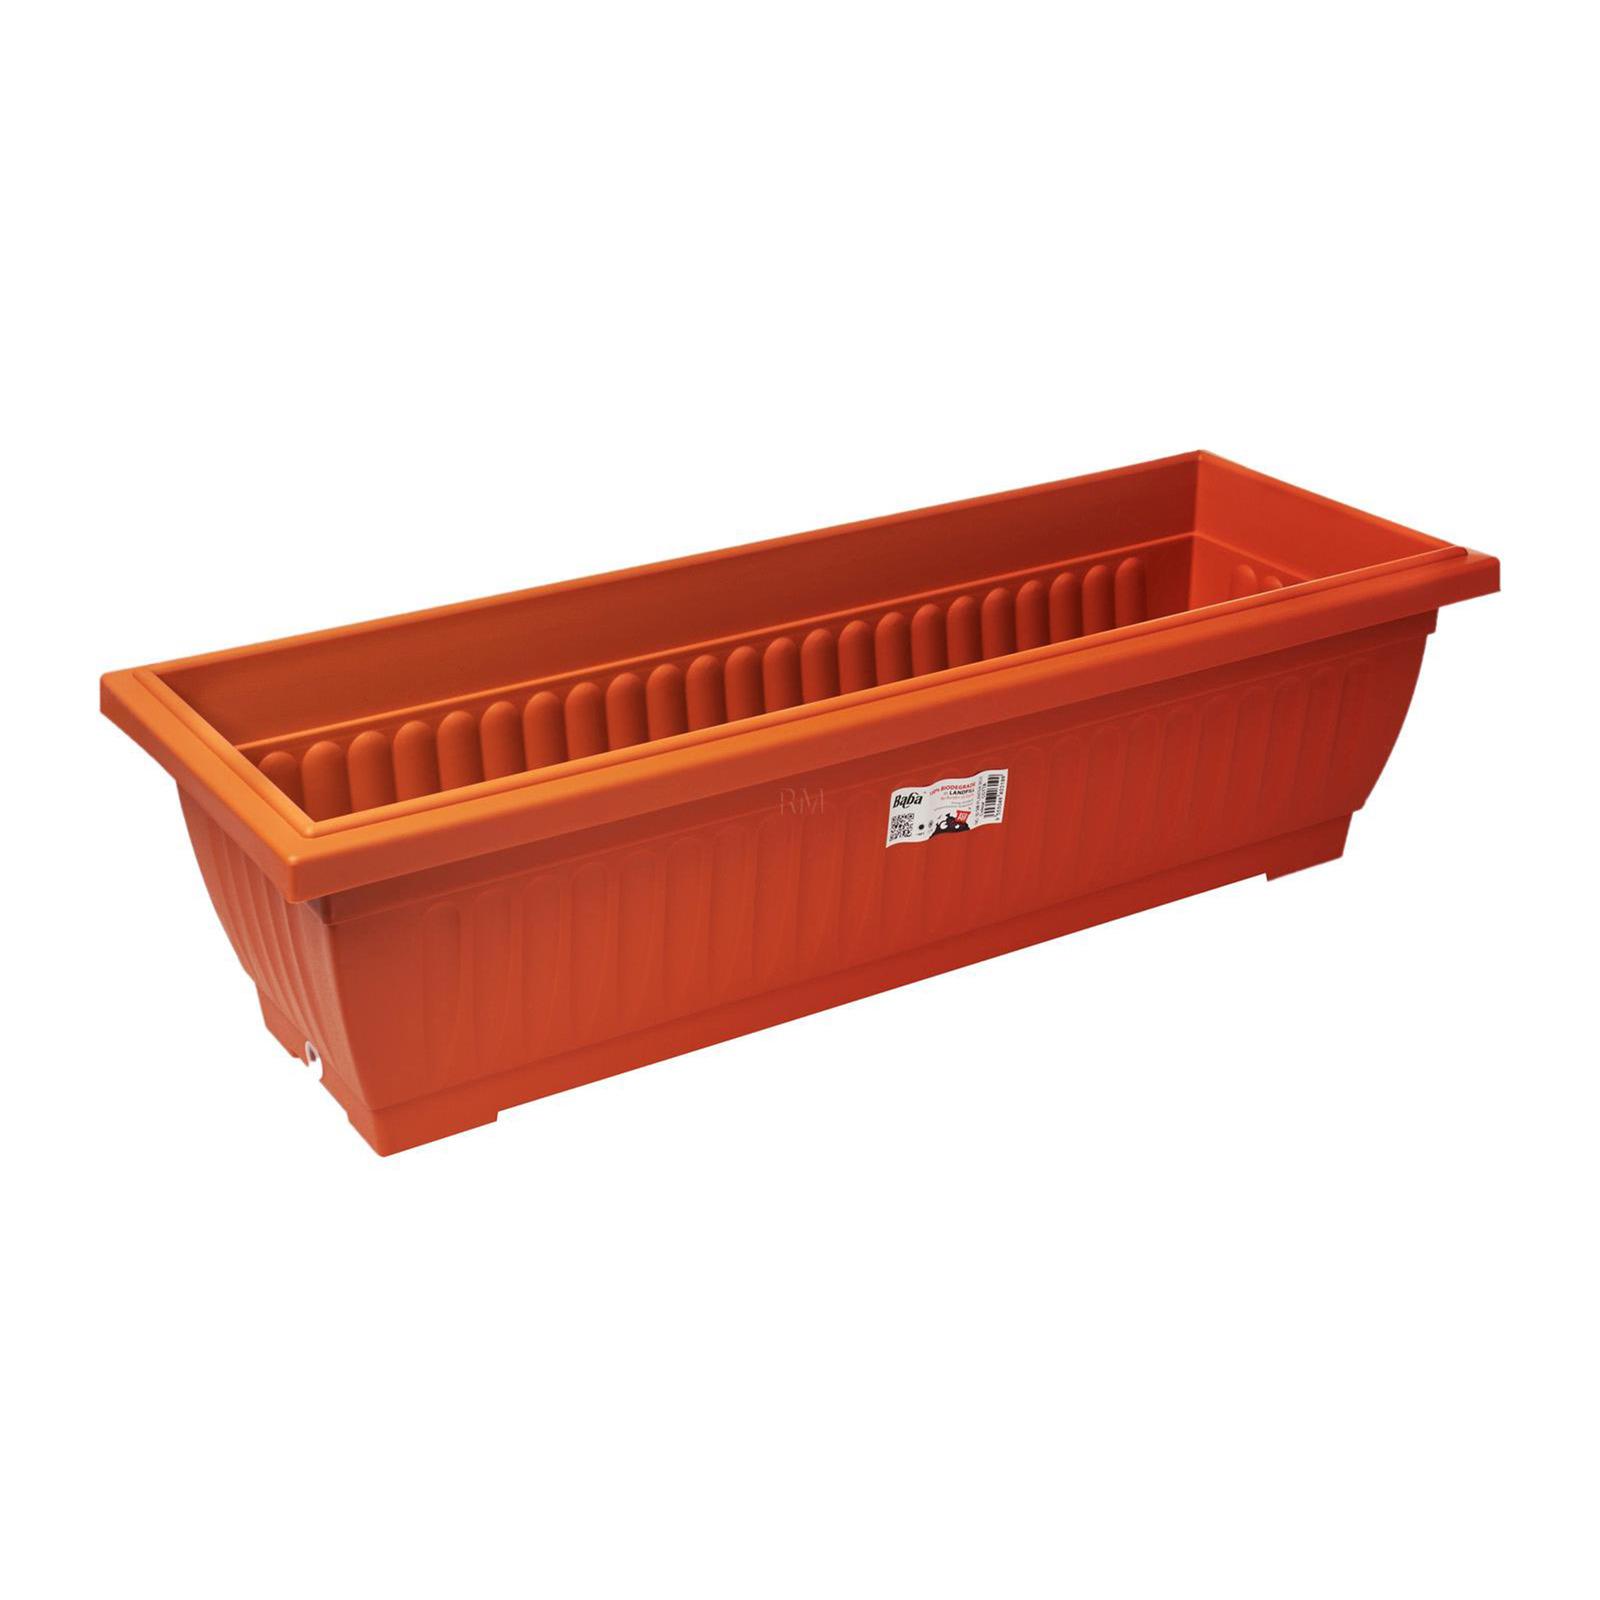 Baba Planter Box - Cotta (685mm X 245mm)